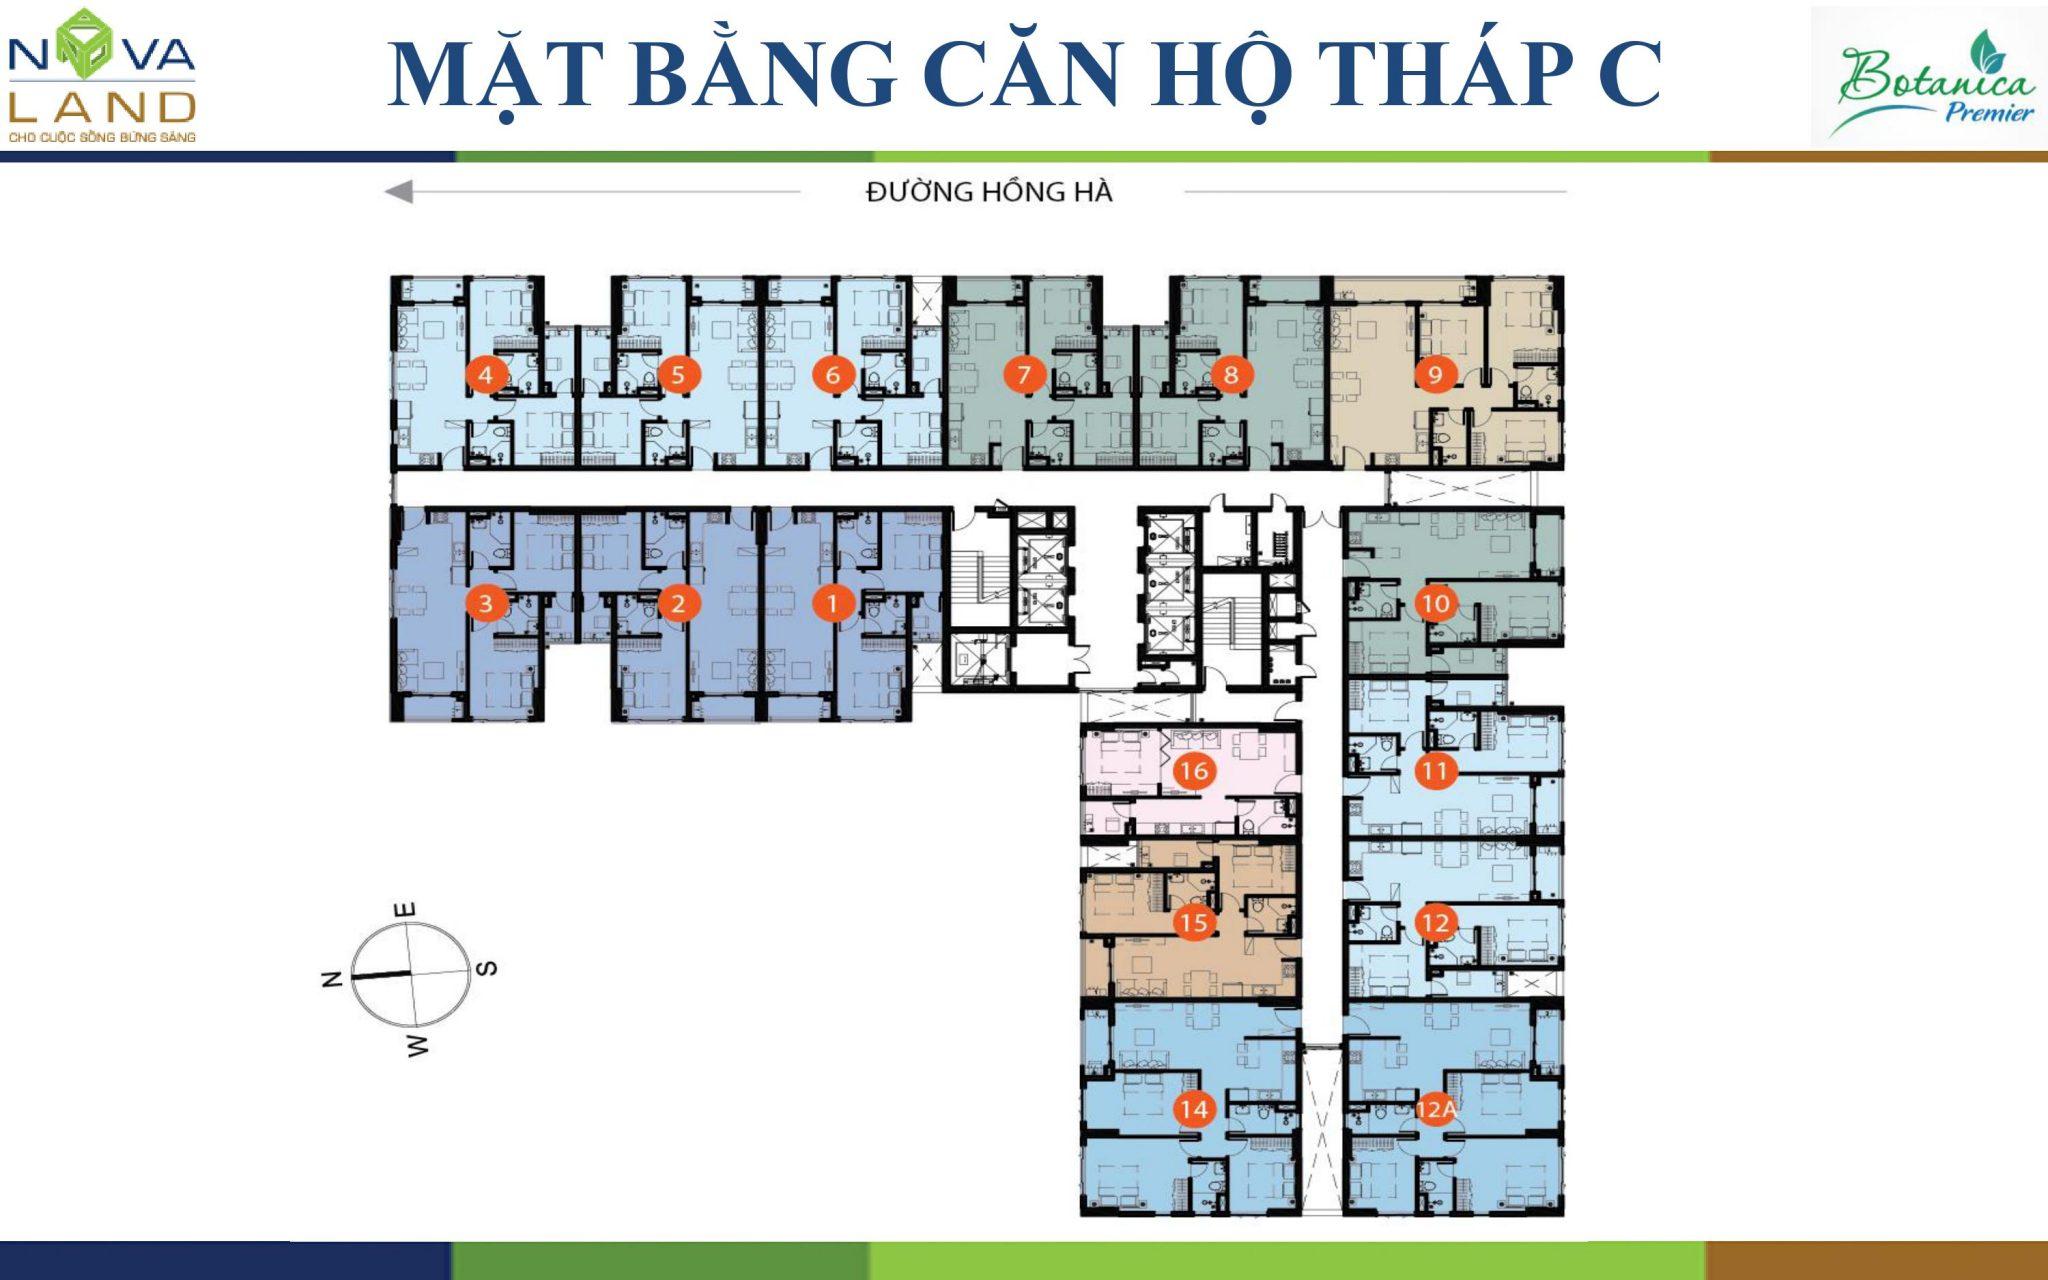 mat-bang-can-ho-thap-C-botanica-premier